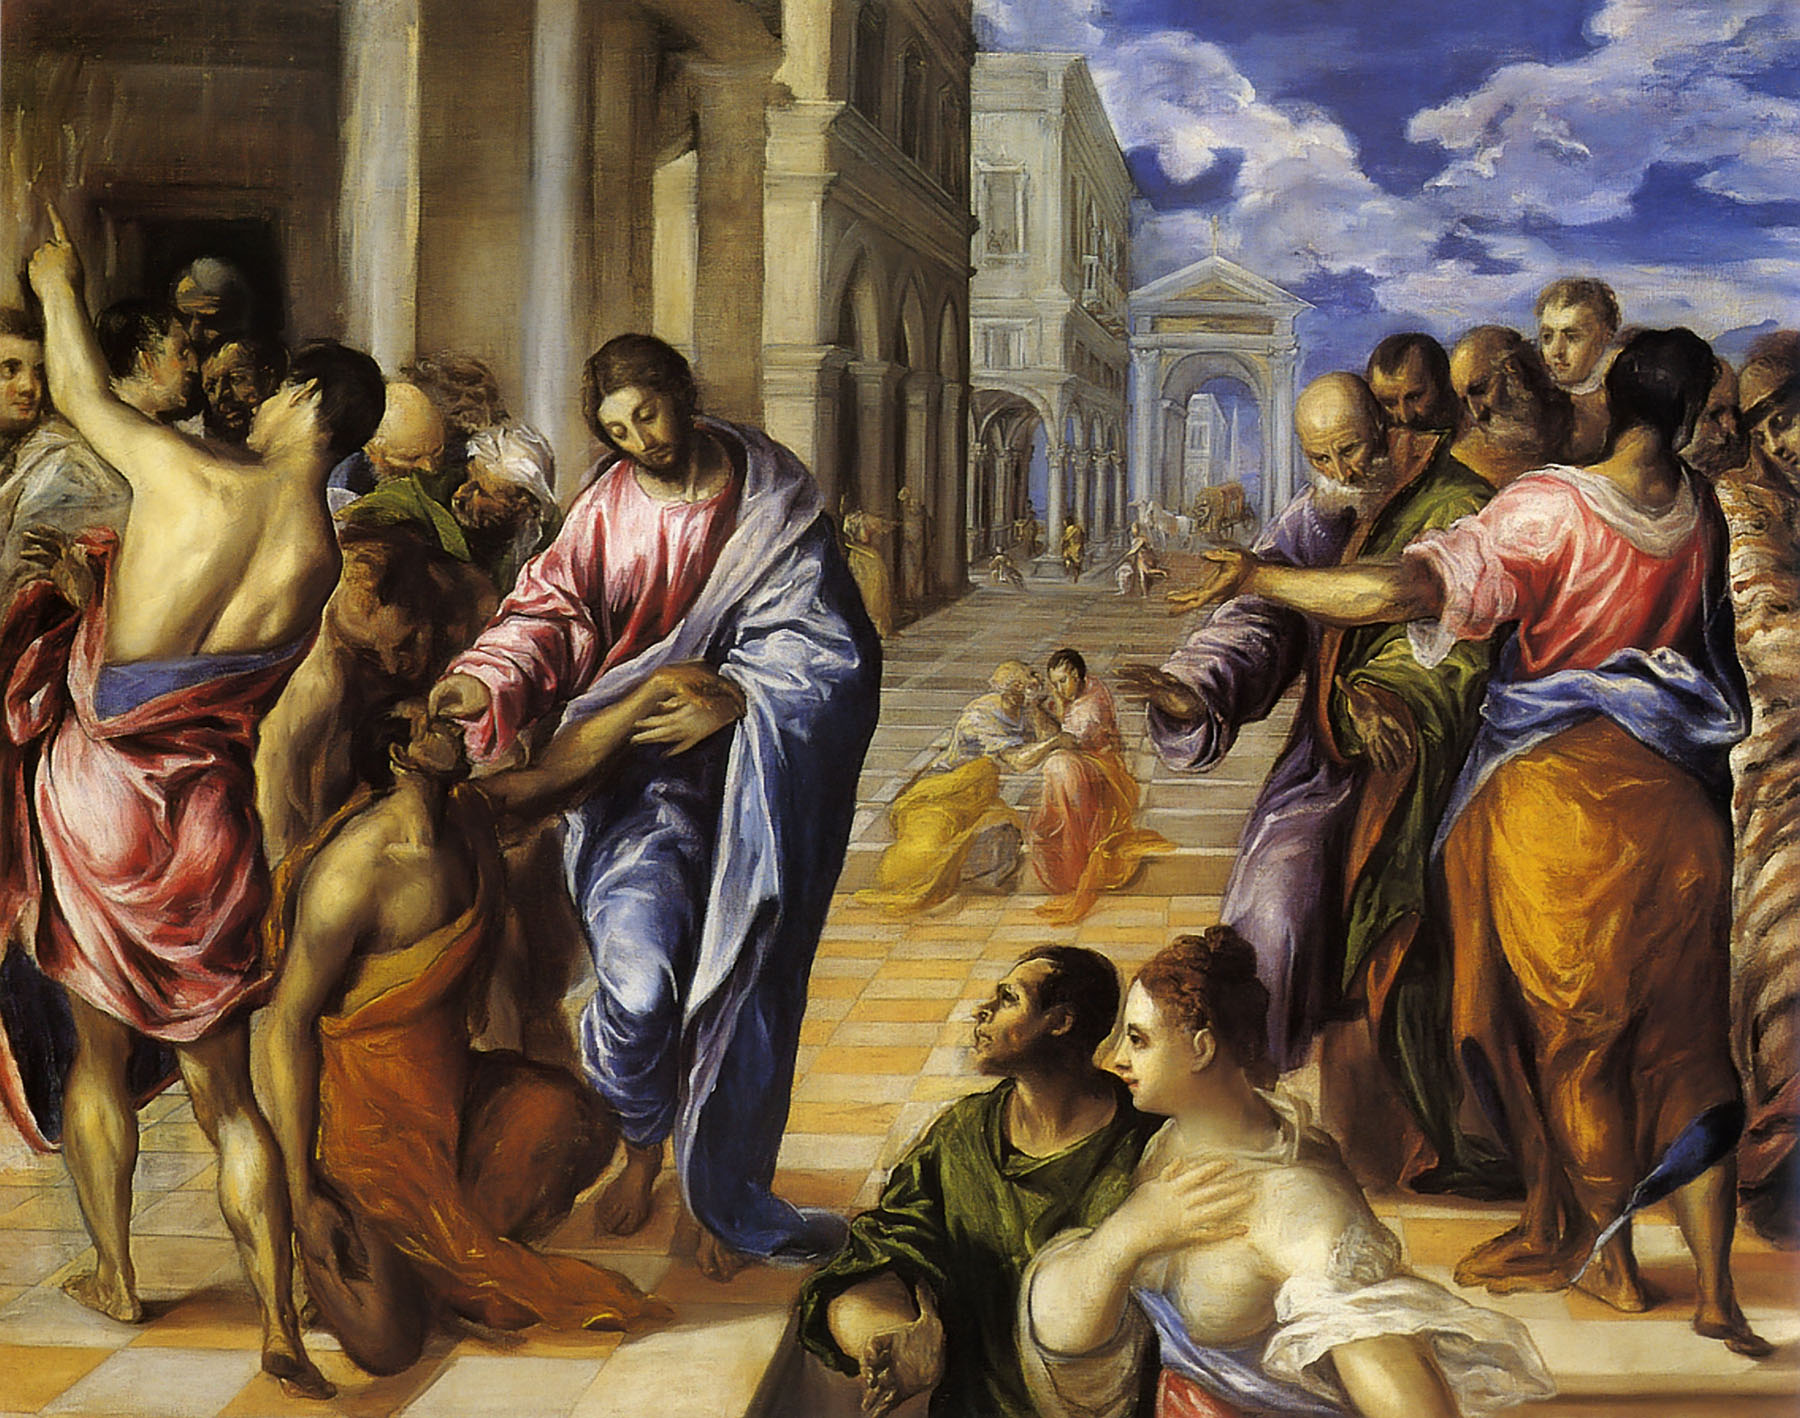 Jesus Healing the Blind, El Greco dans immagini sacre healing_the_blind_elgreco